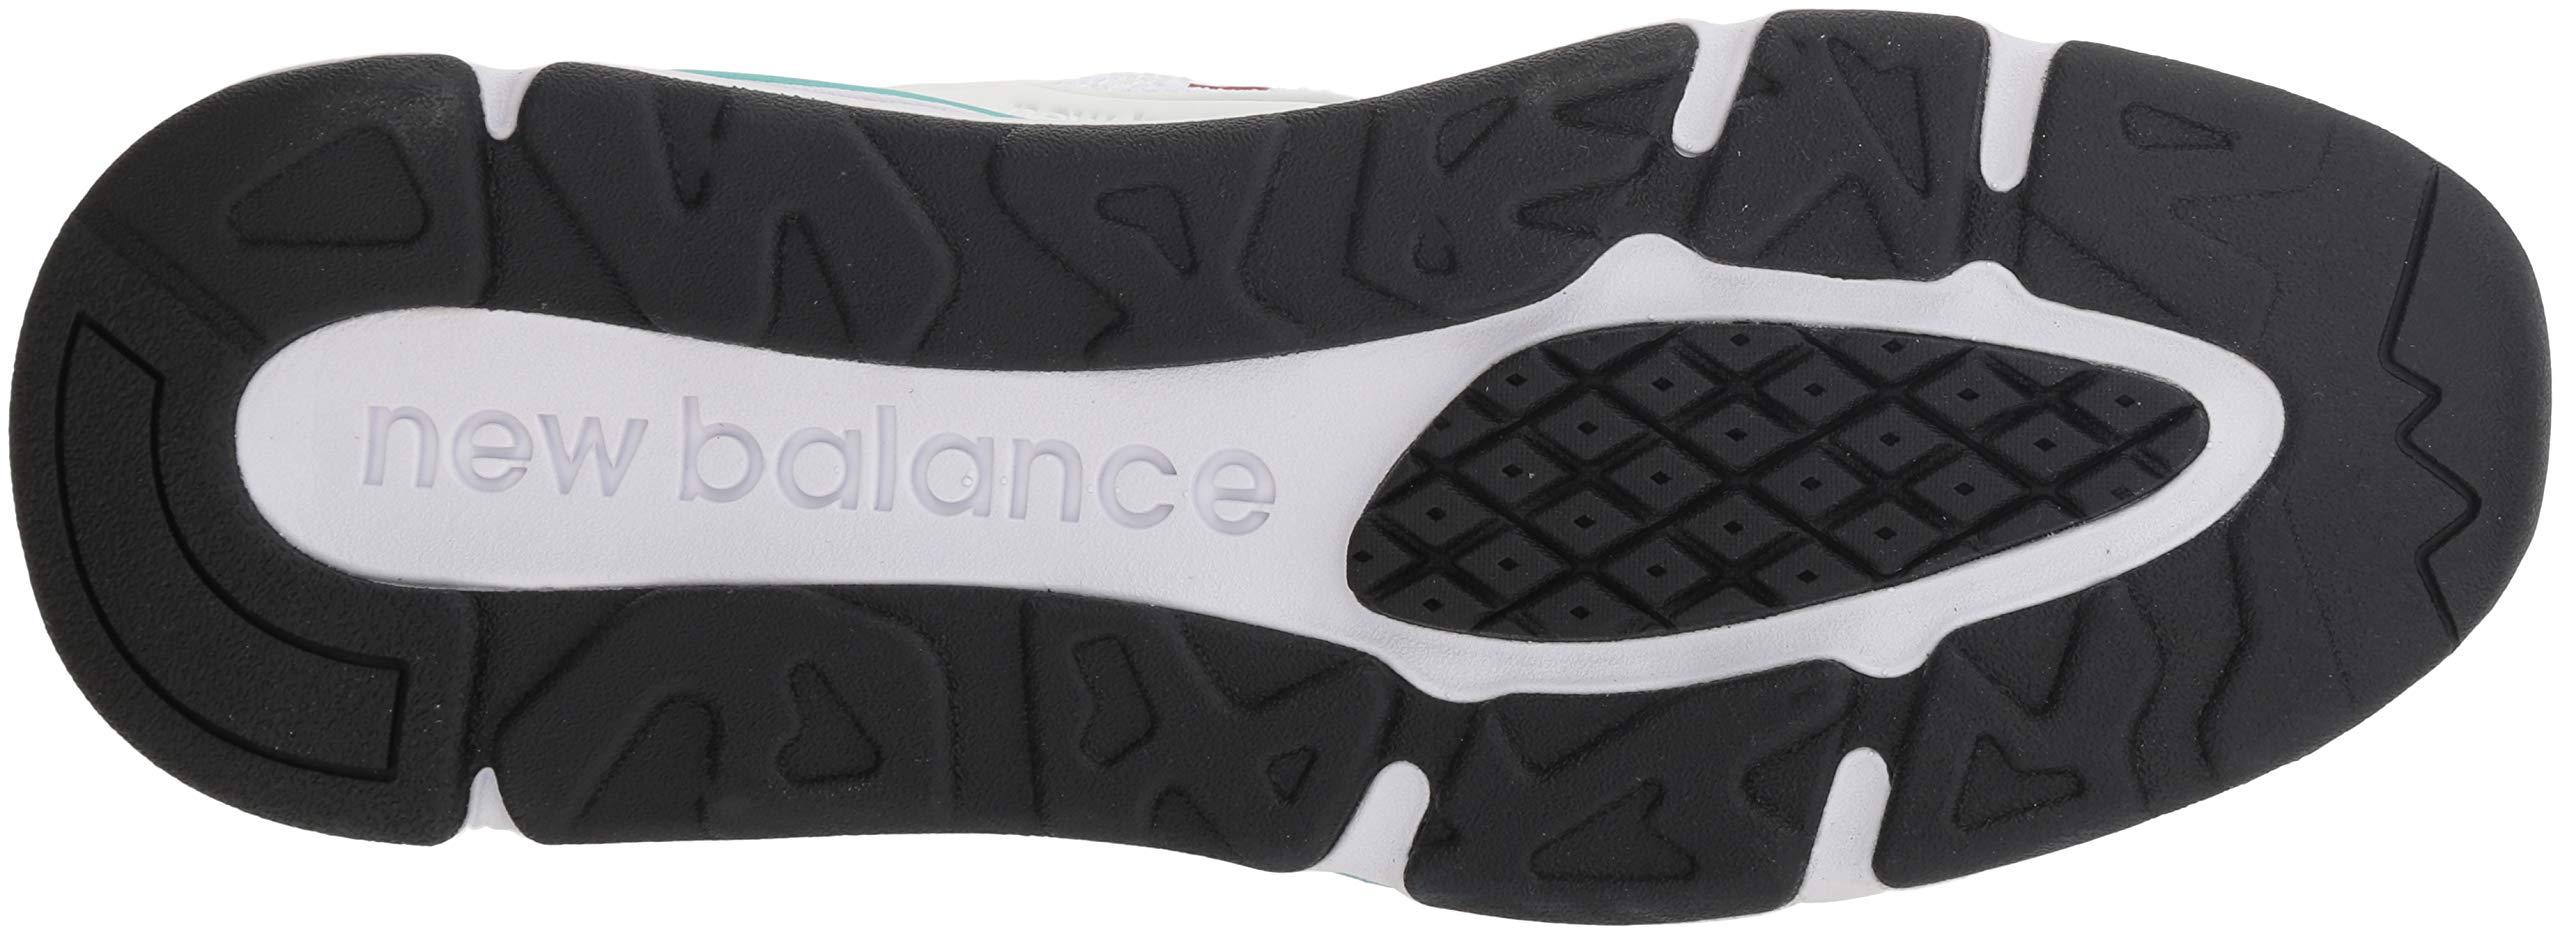 new balance fille 23